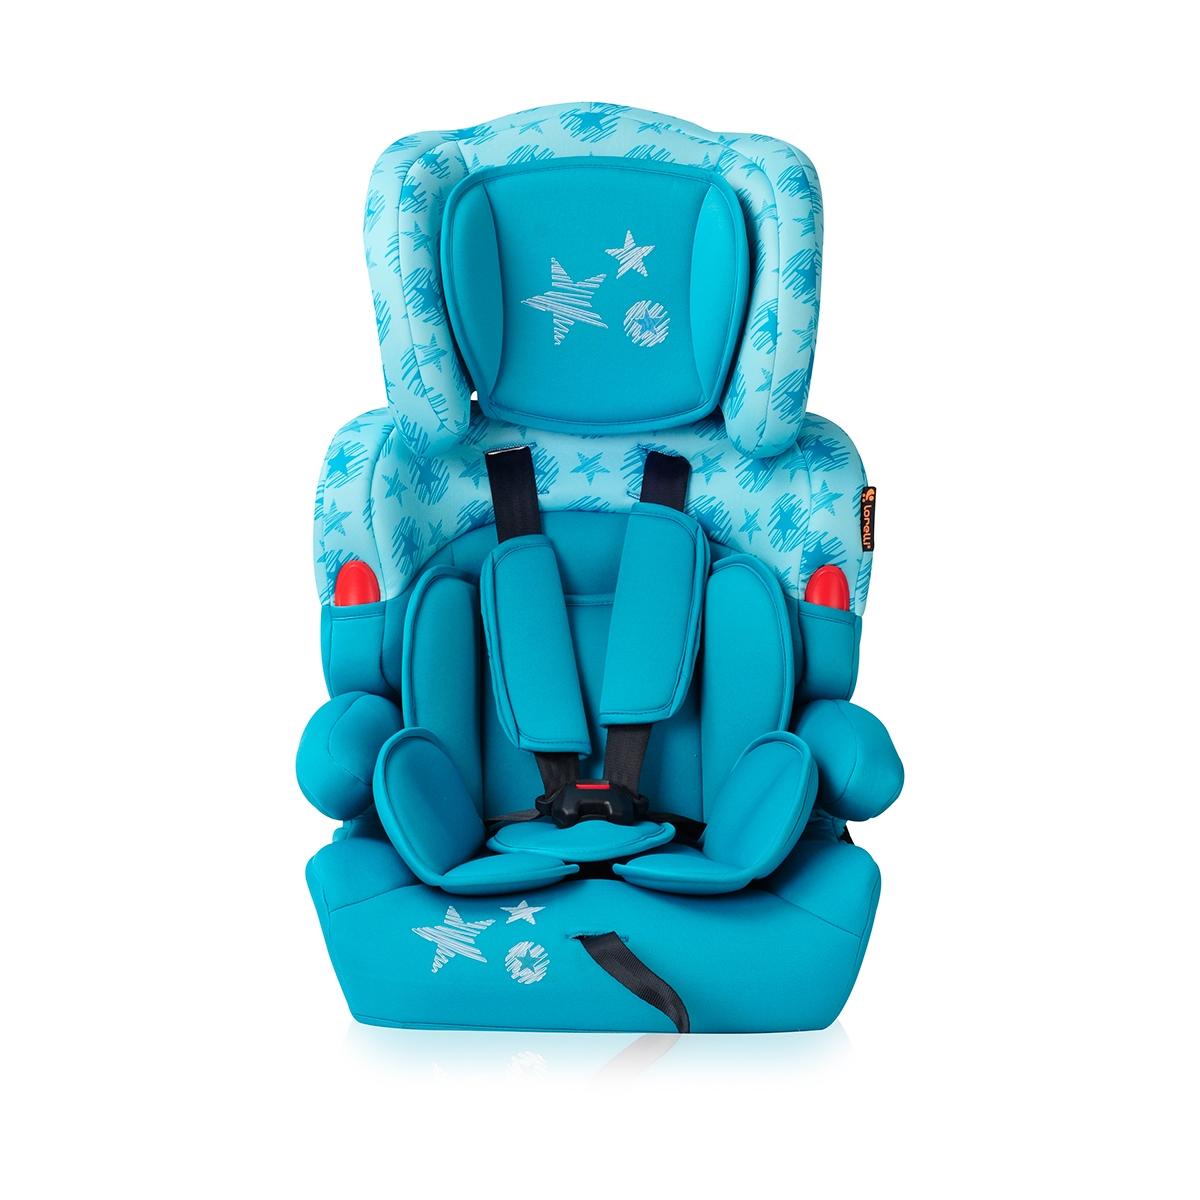 scaun auto copii lorelli classic kiddy - aquamarine stars